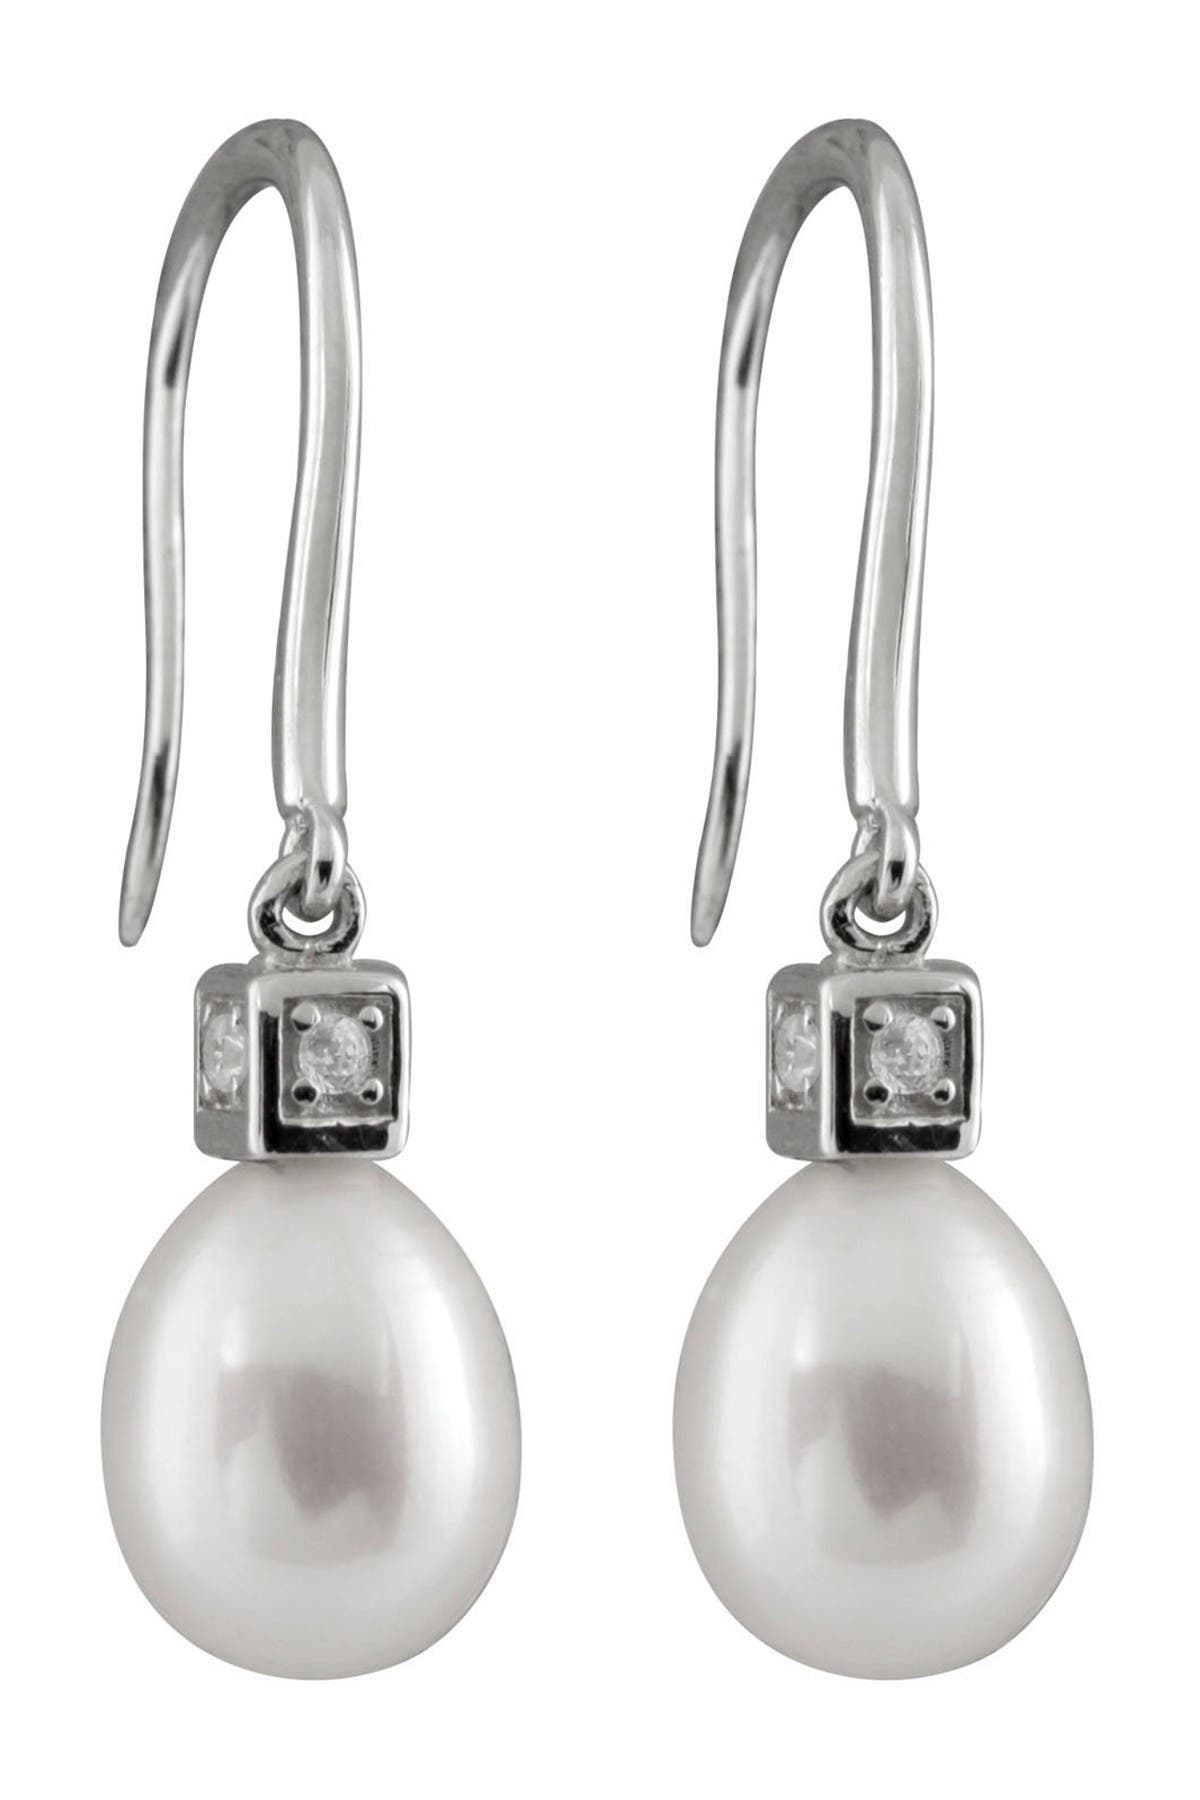 Image of Splendid Pearls 7.5-8mm White Freshwater Pearl & CZ Drop Earrings